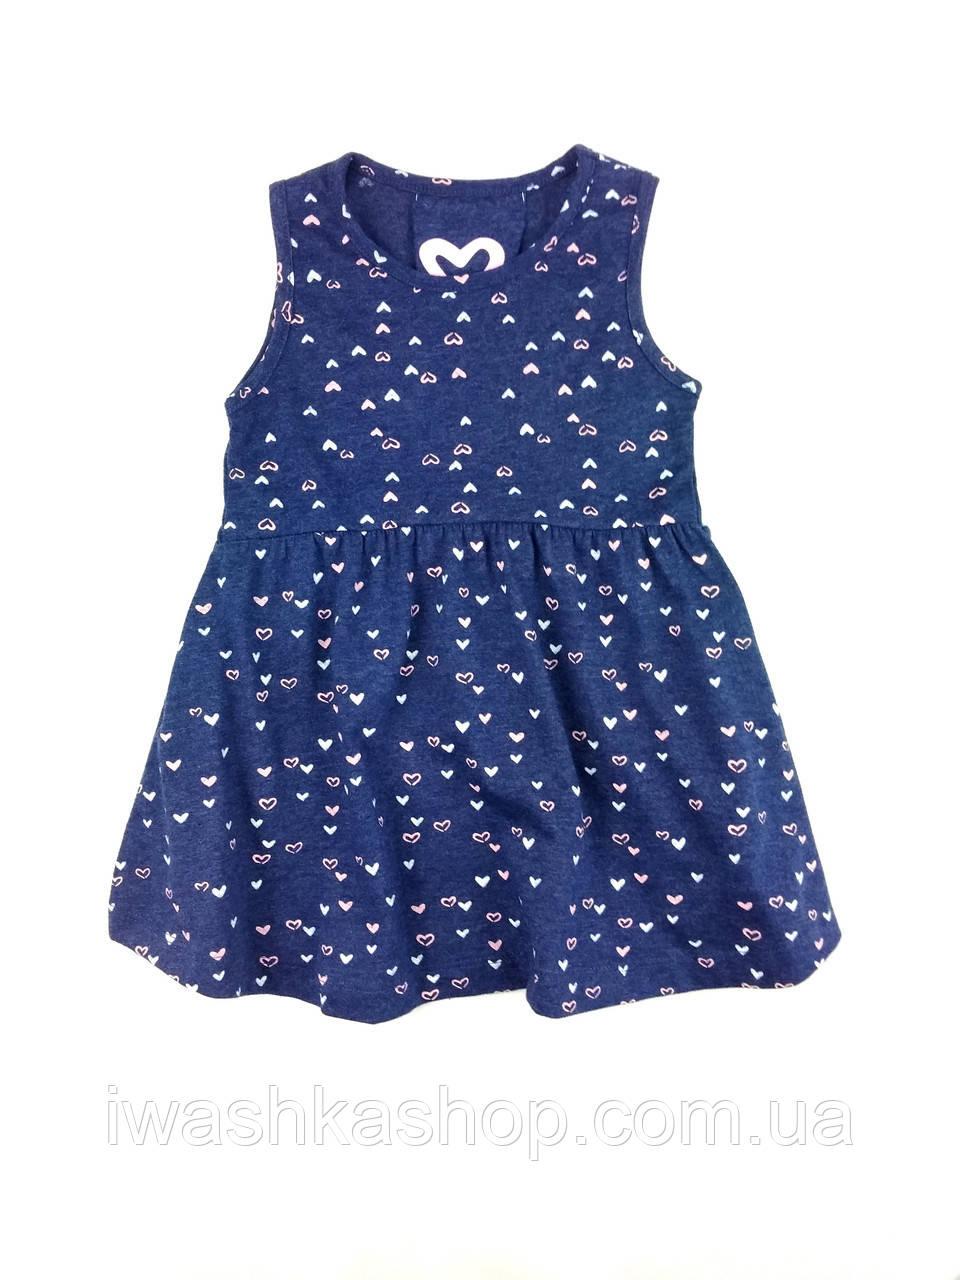 Летний синий сарафан в сердечки на девочек 3 - 4 лет, р. 104, Young Dimension by Primark